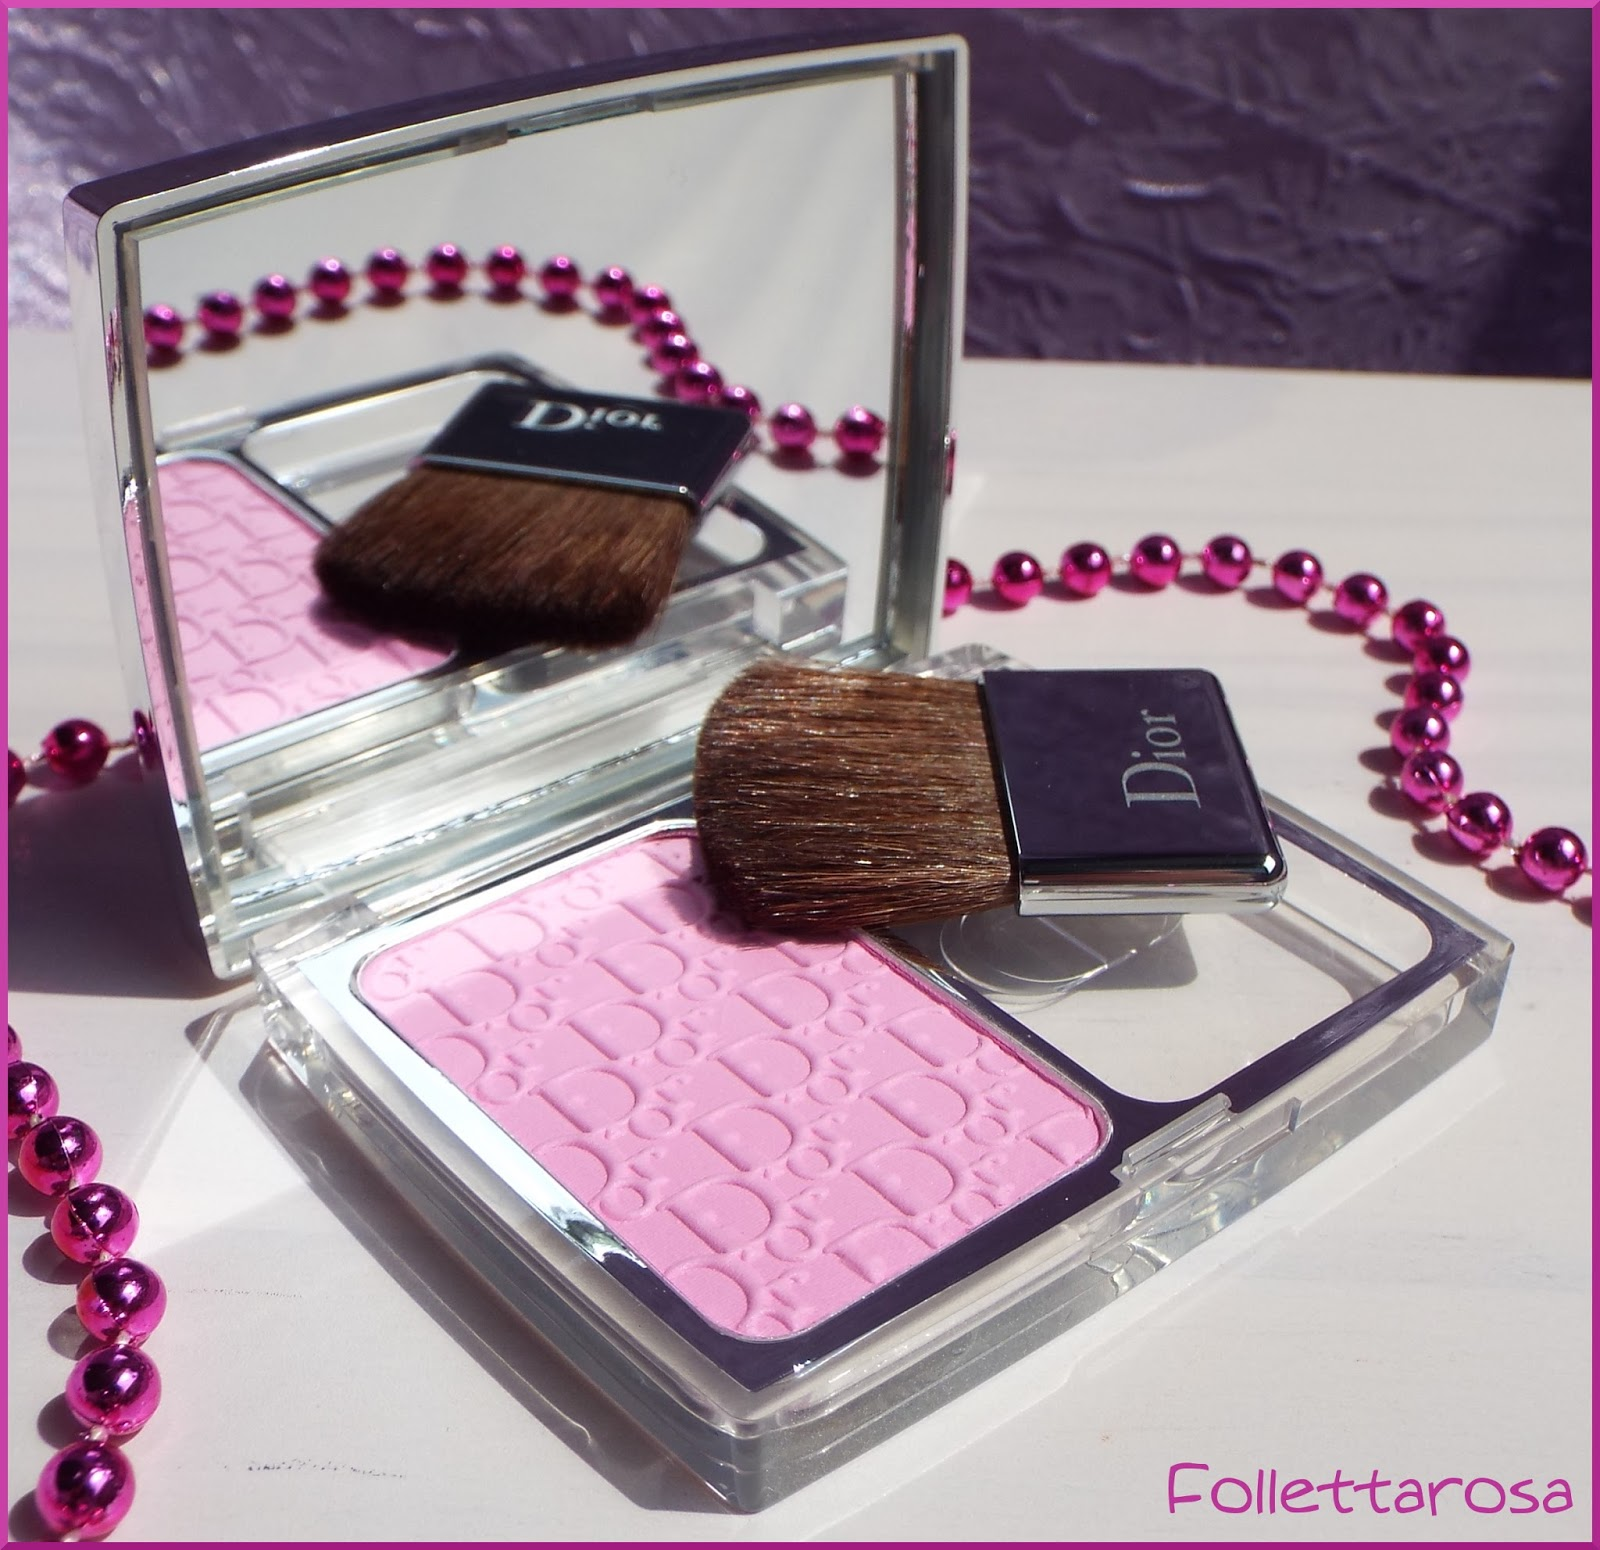 recensione blush dior rosy glow